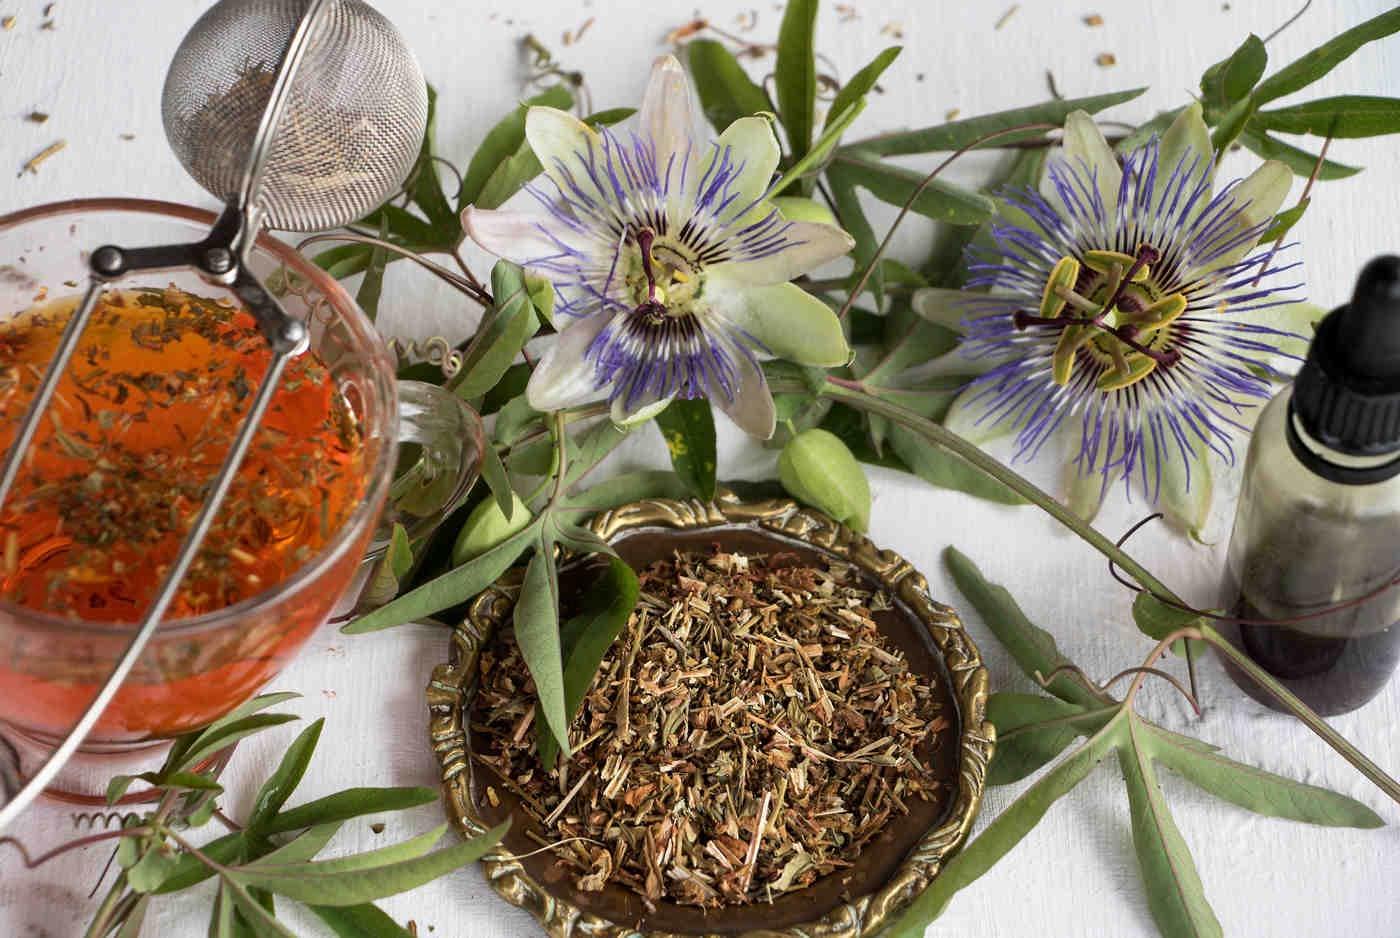 Passiflora - beneficii și contraindicații